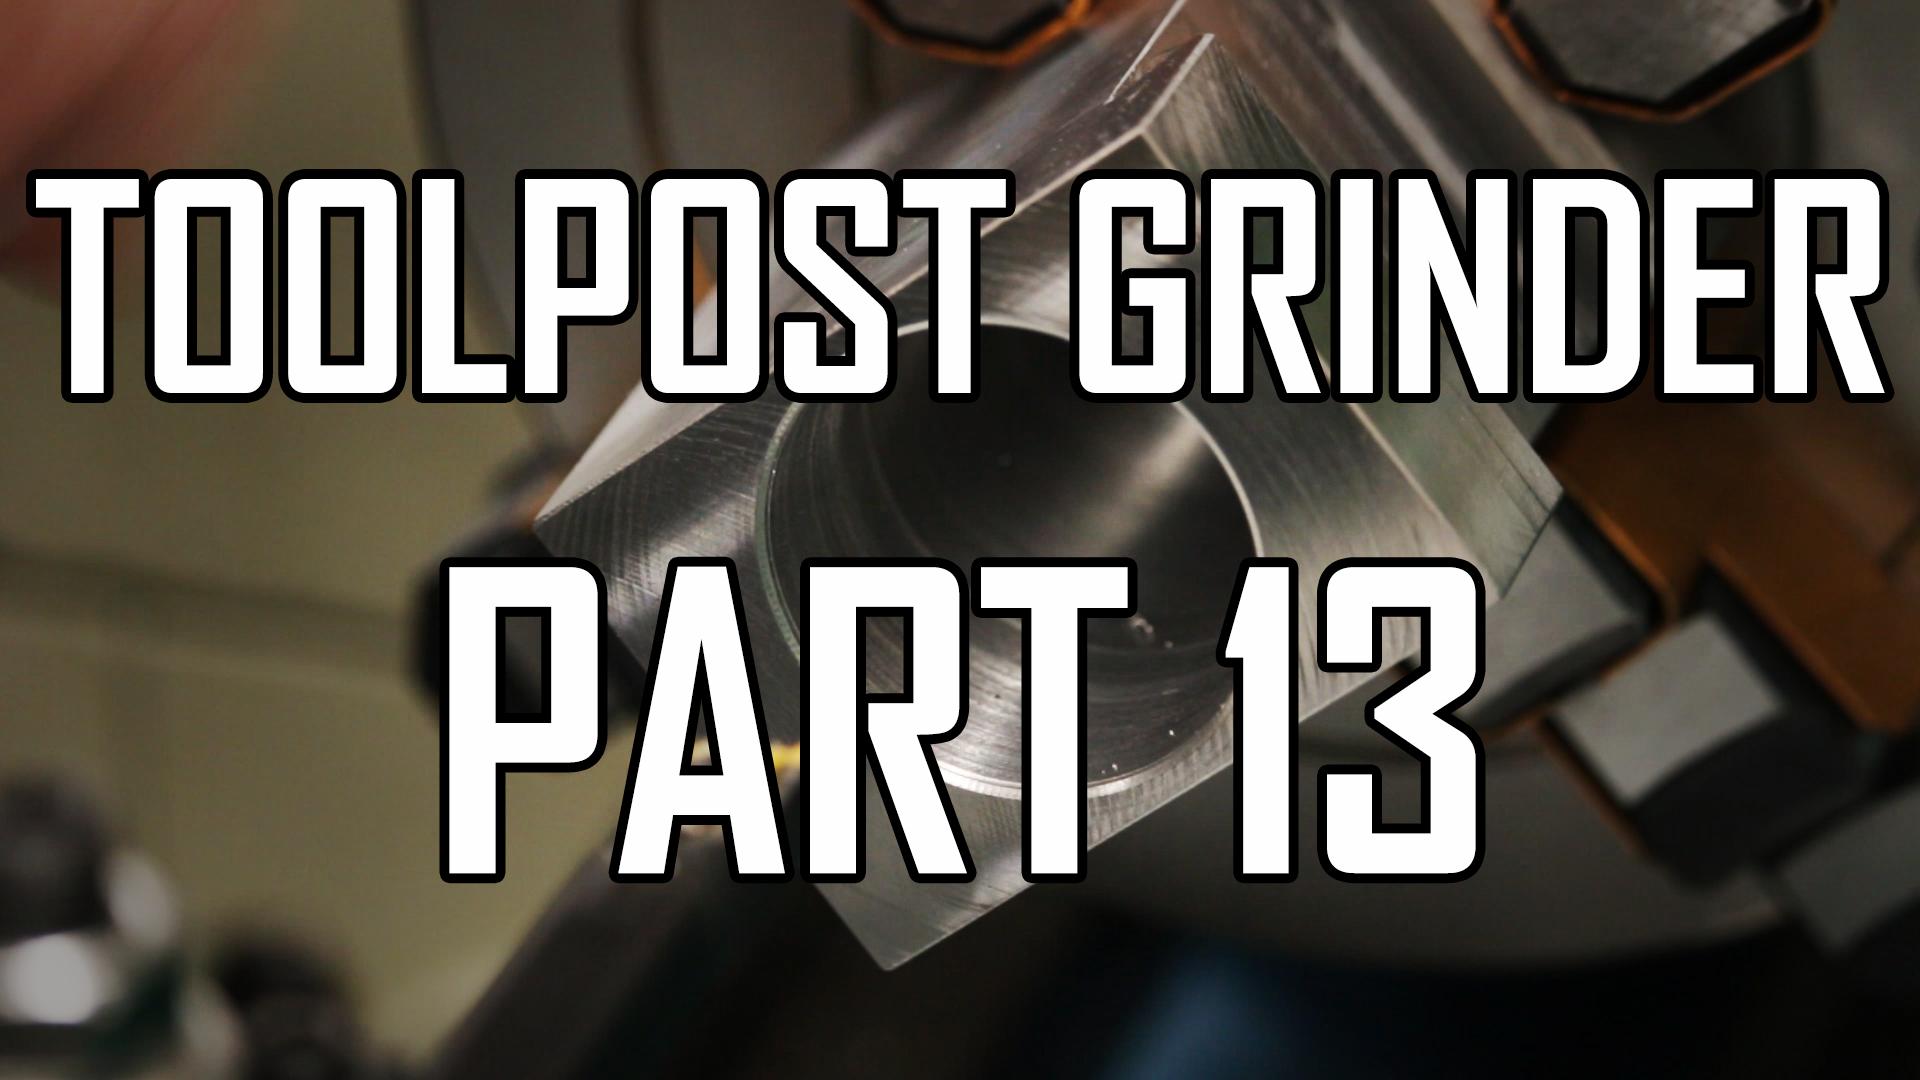 Toolpost Grinder Part 13: Tooolpost Clamp 2